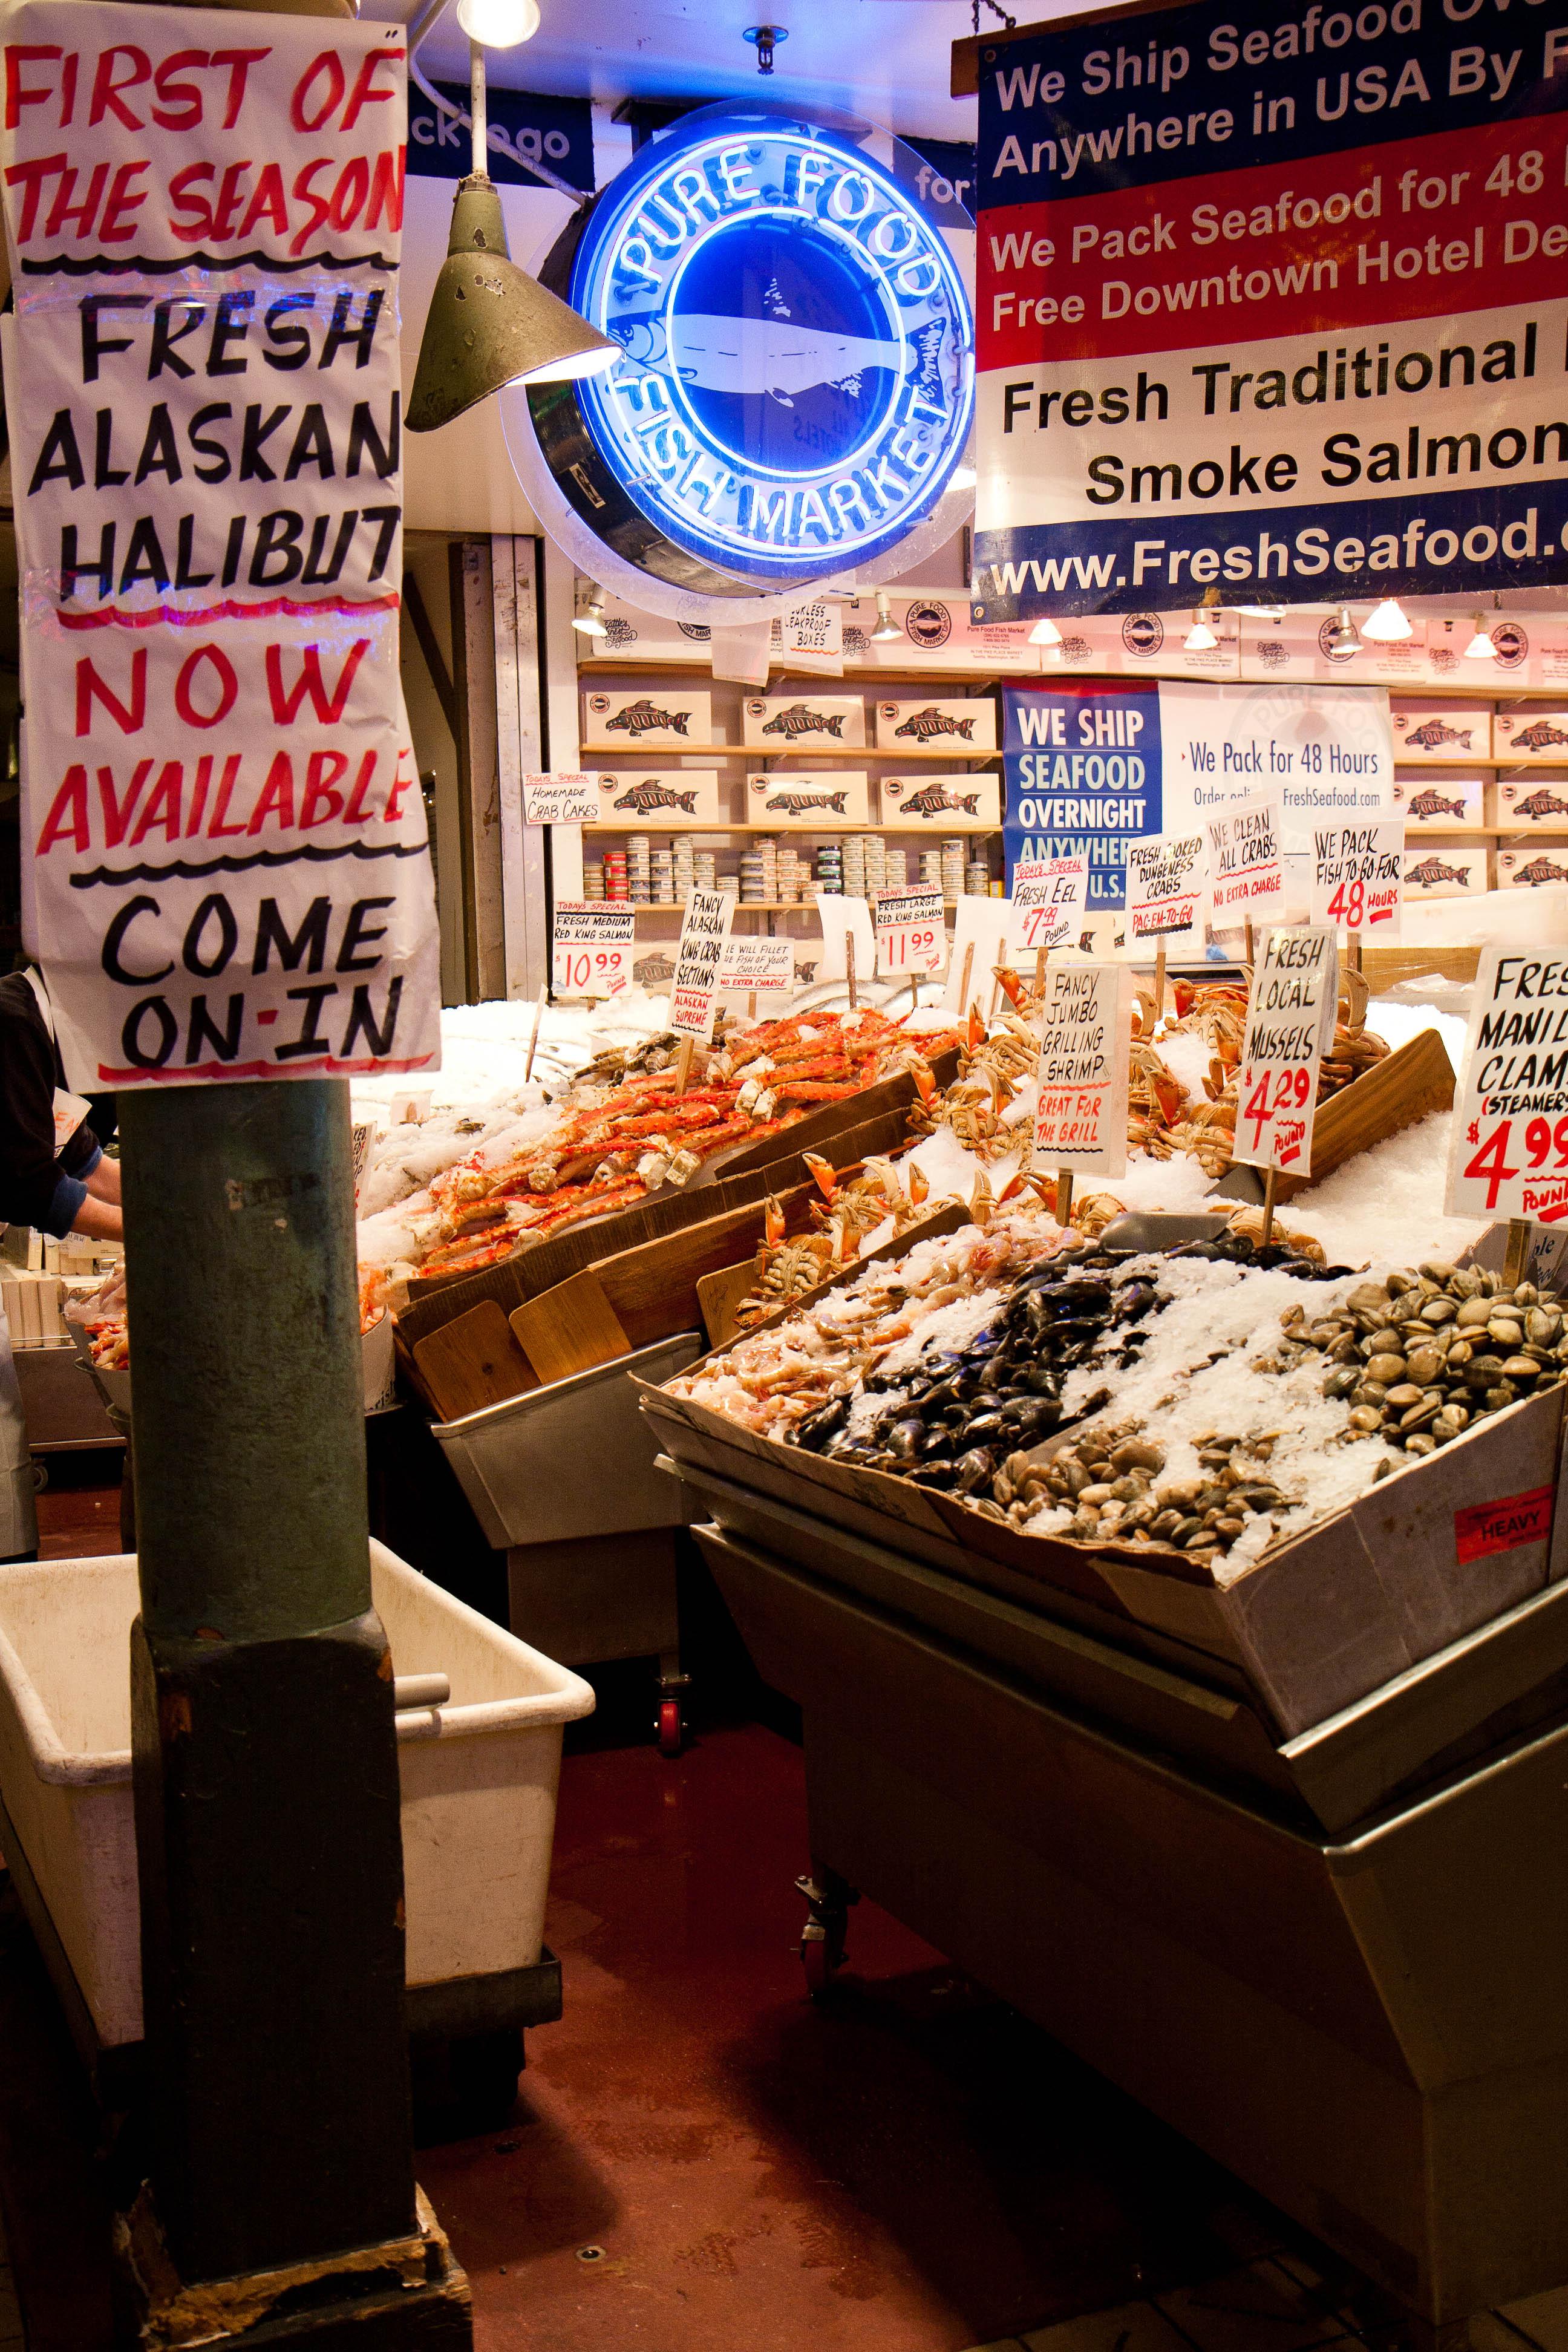 Pure food fish market 1 explore alanosaur 39 s photos on for Pure food fish market